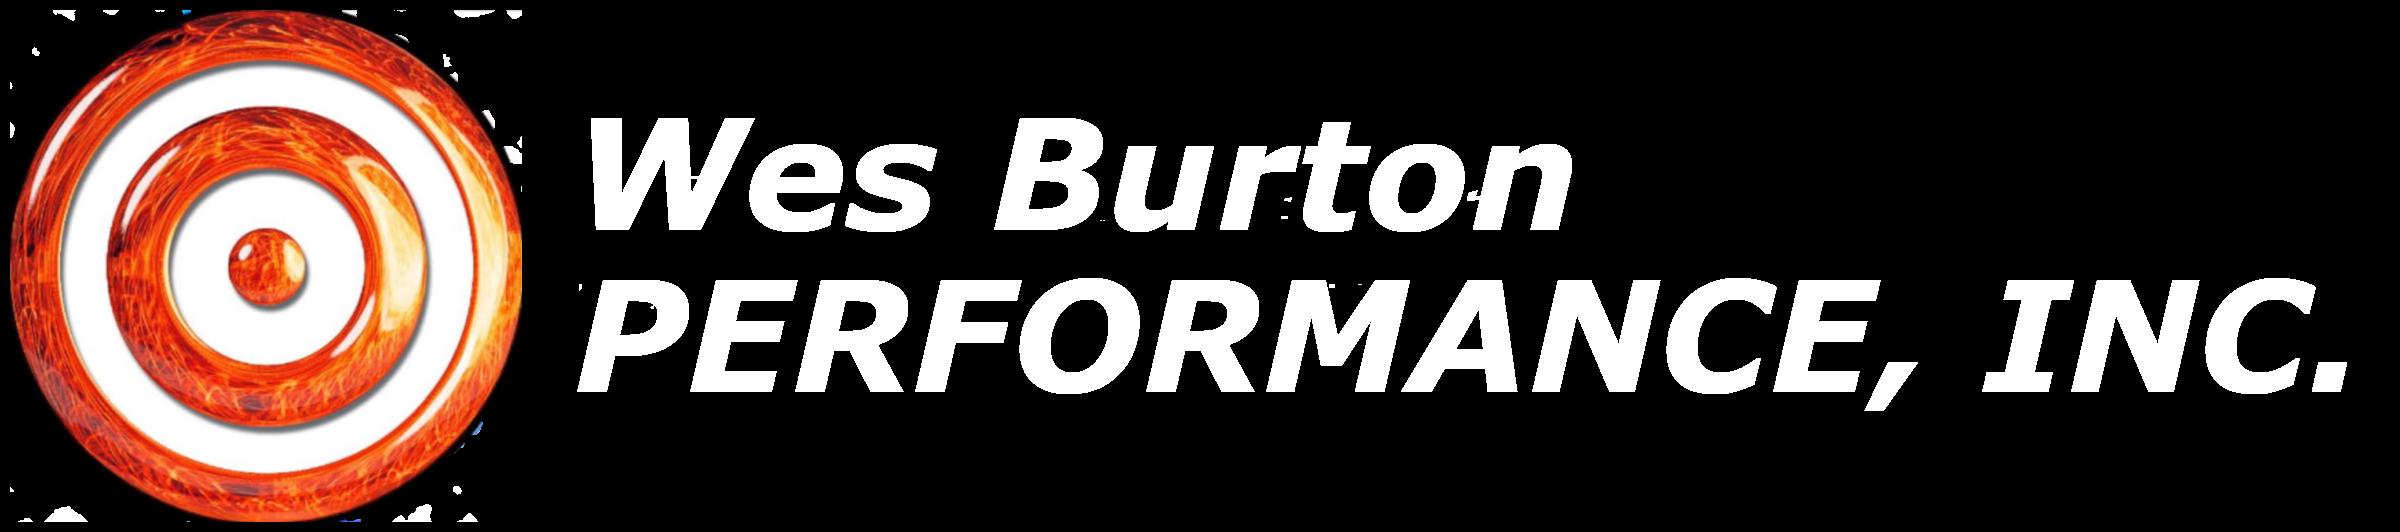 Wes Burton Performance